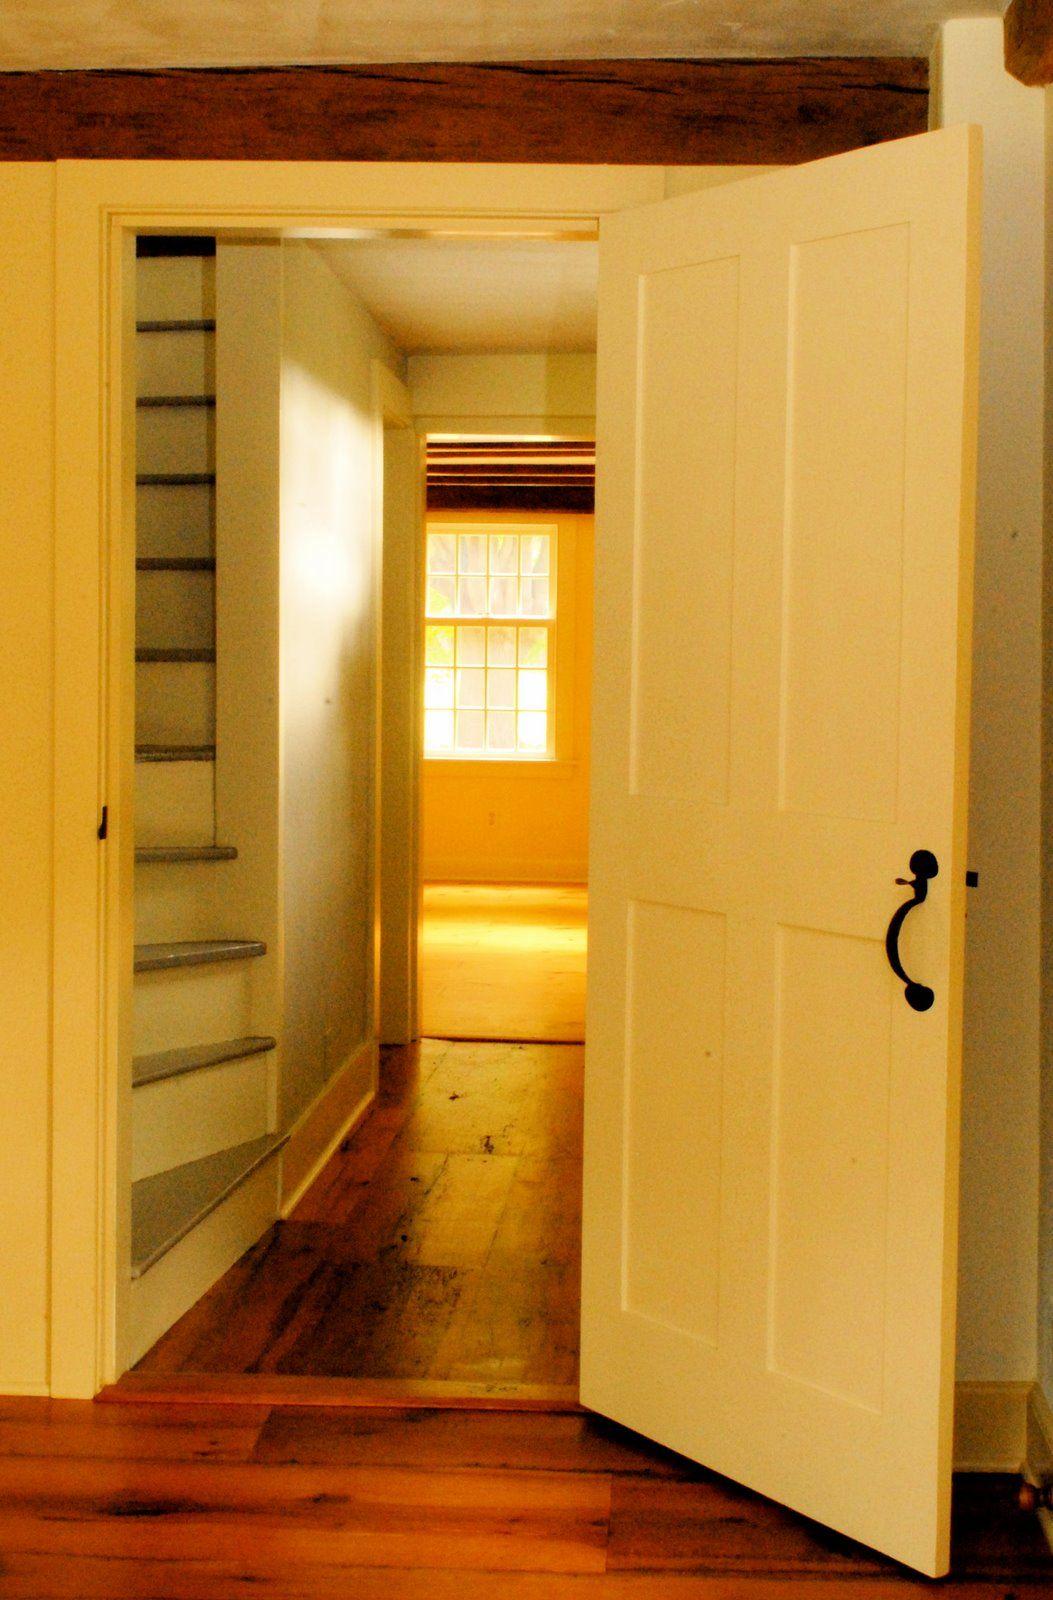 Historical Home: Historic Madison circa 1720 Saltbox Colonial #historichomes